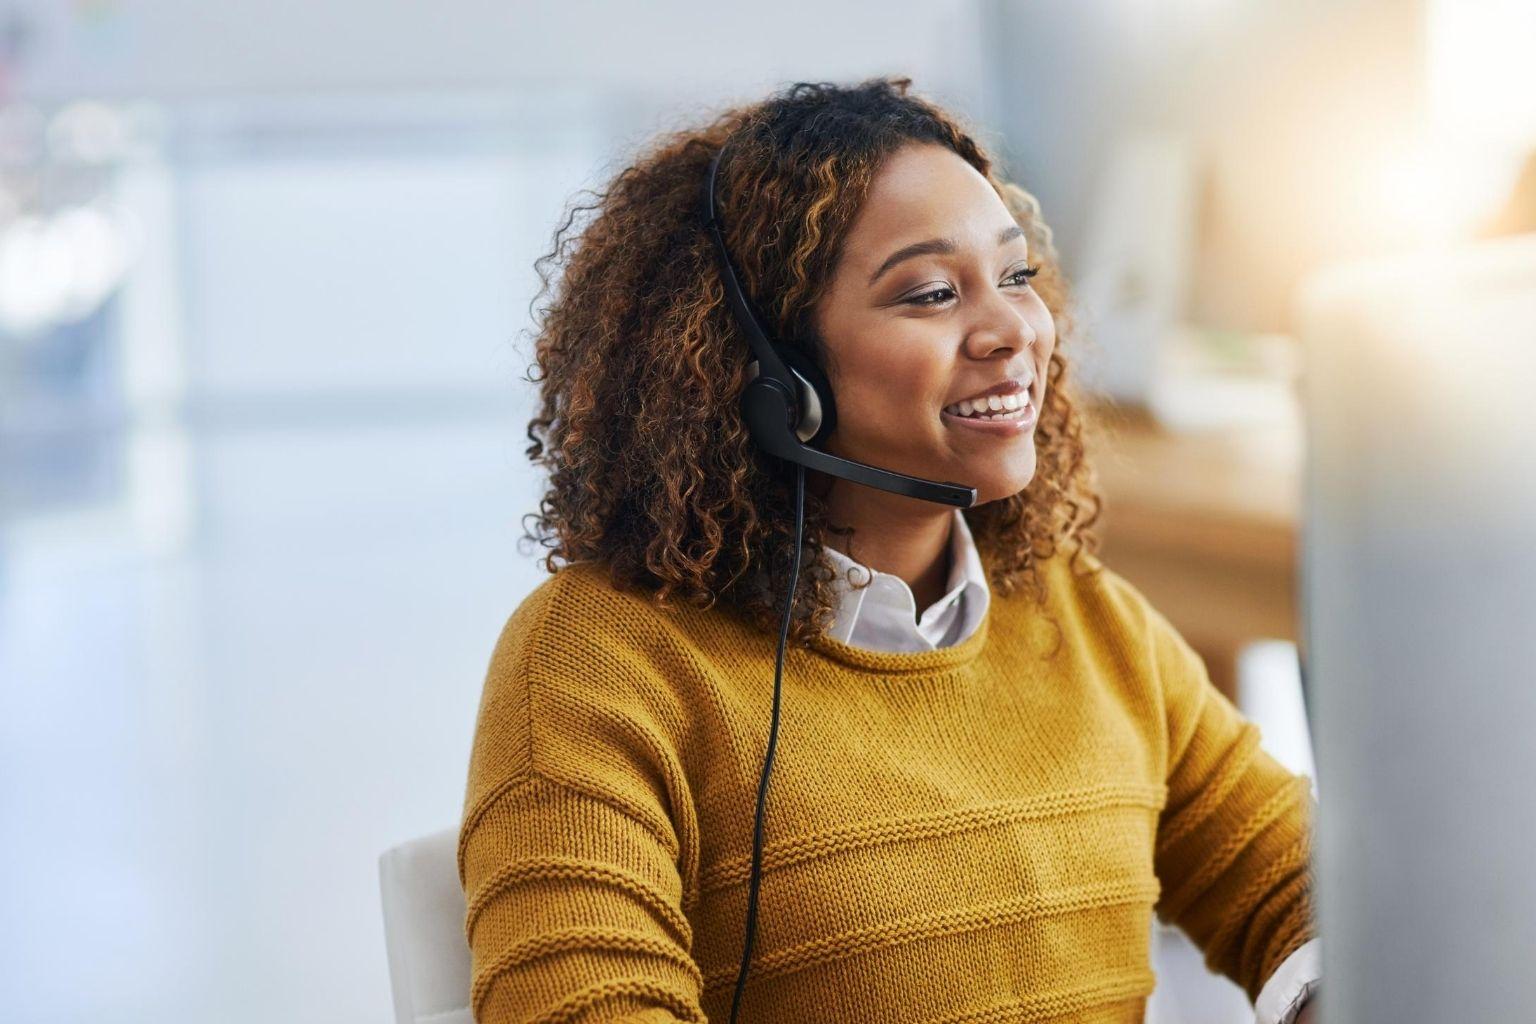 customer service smile